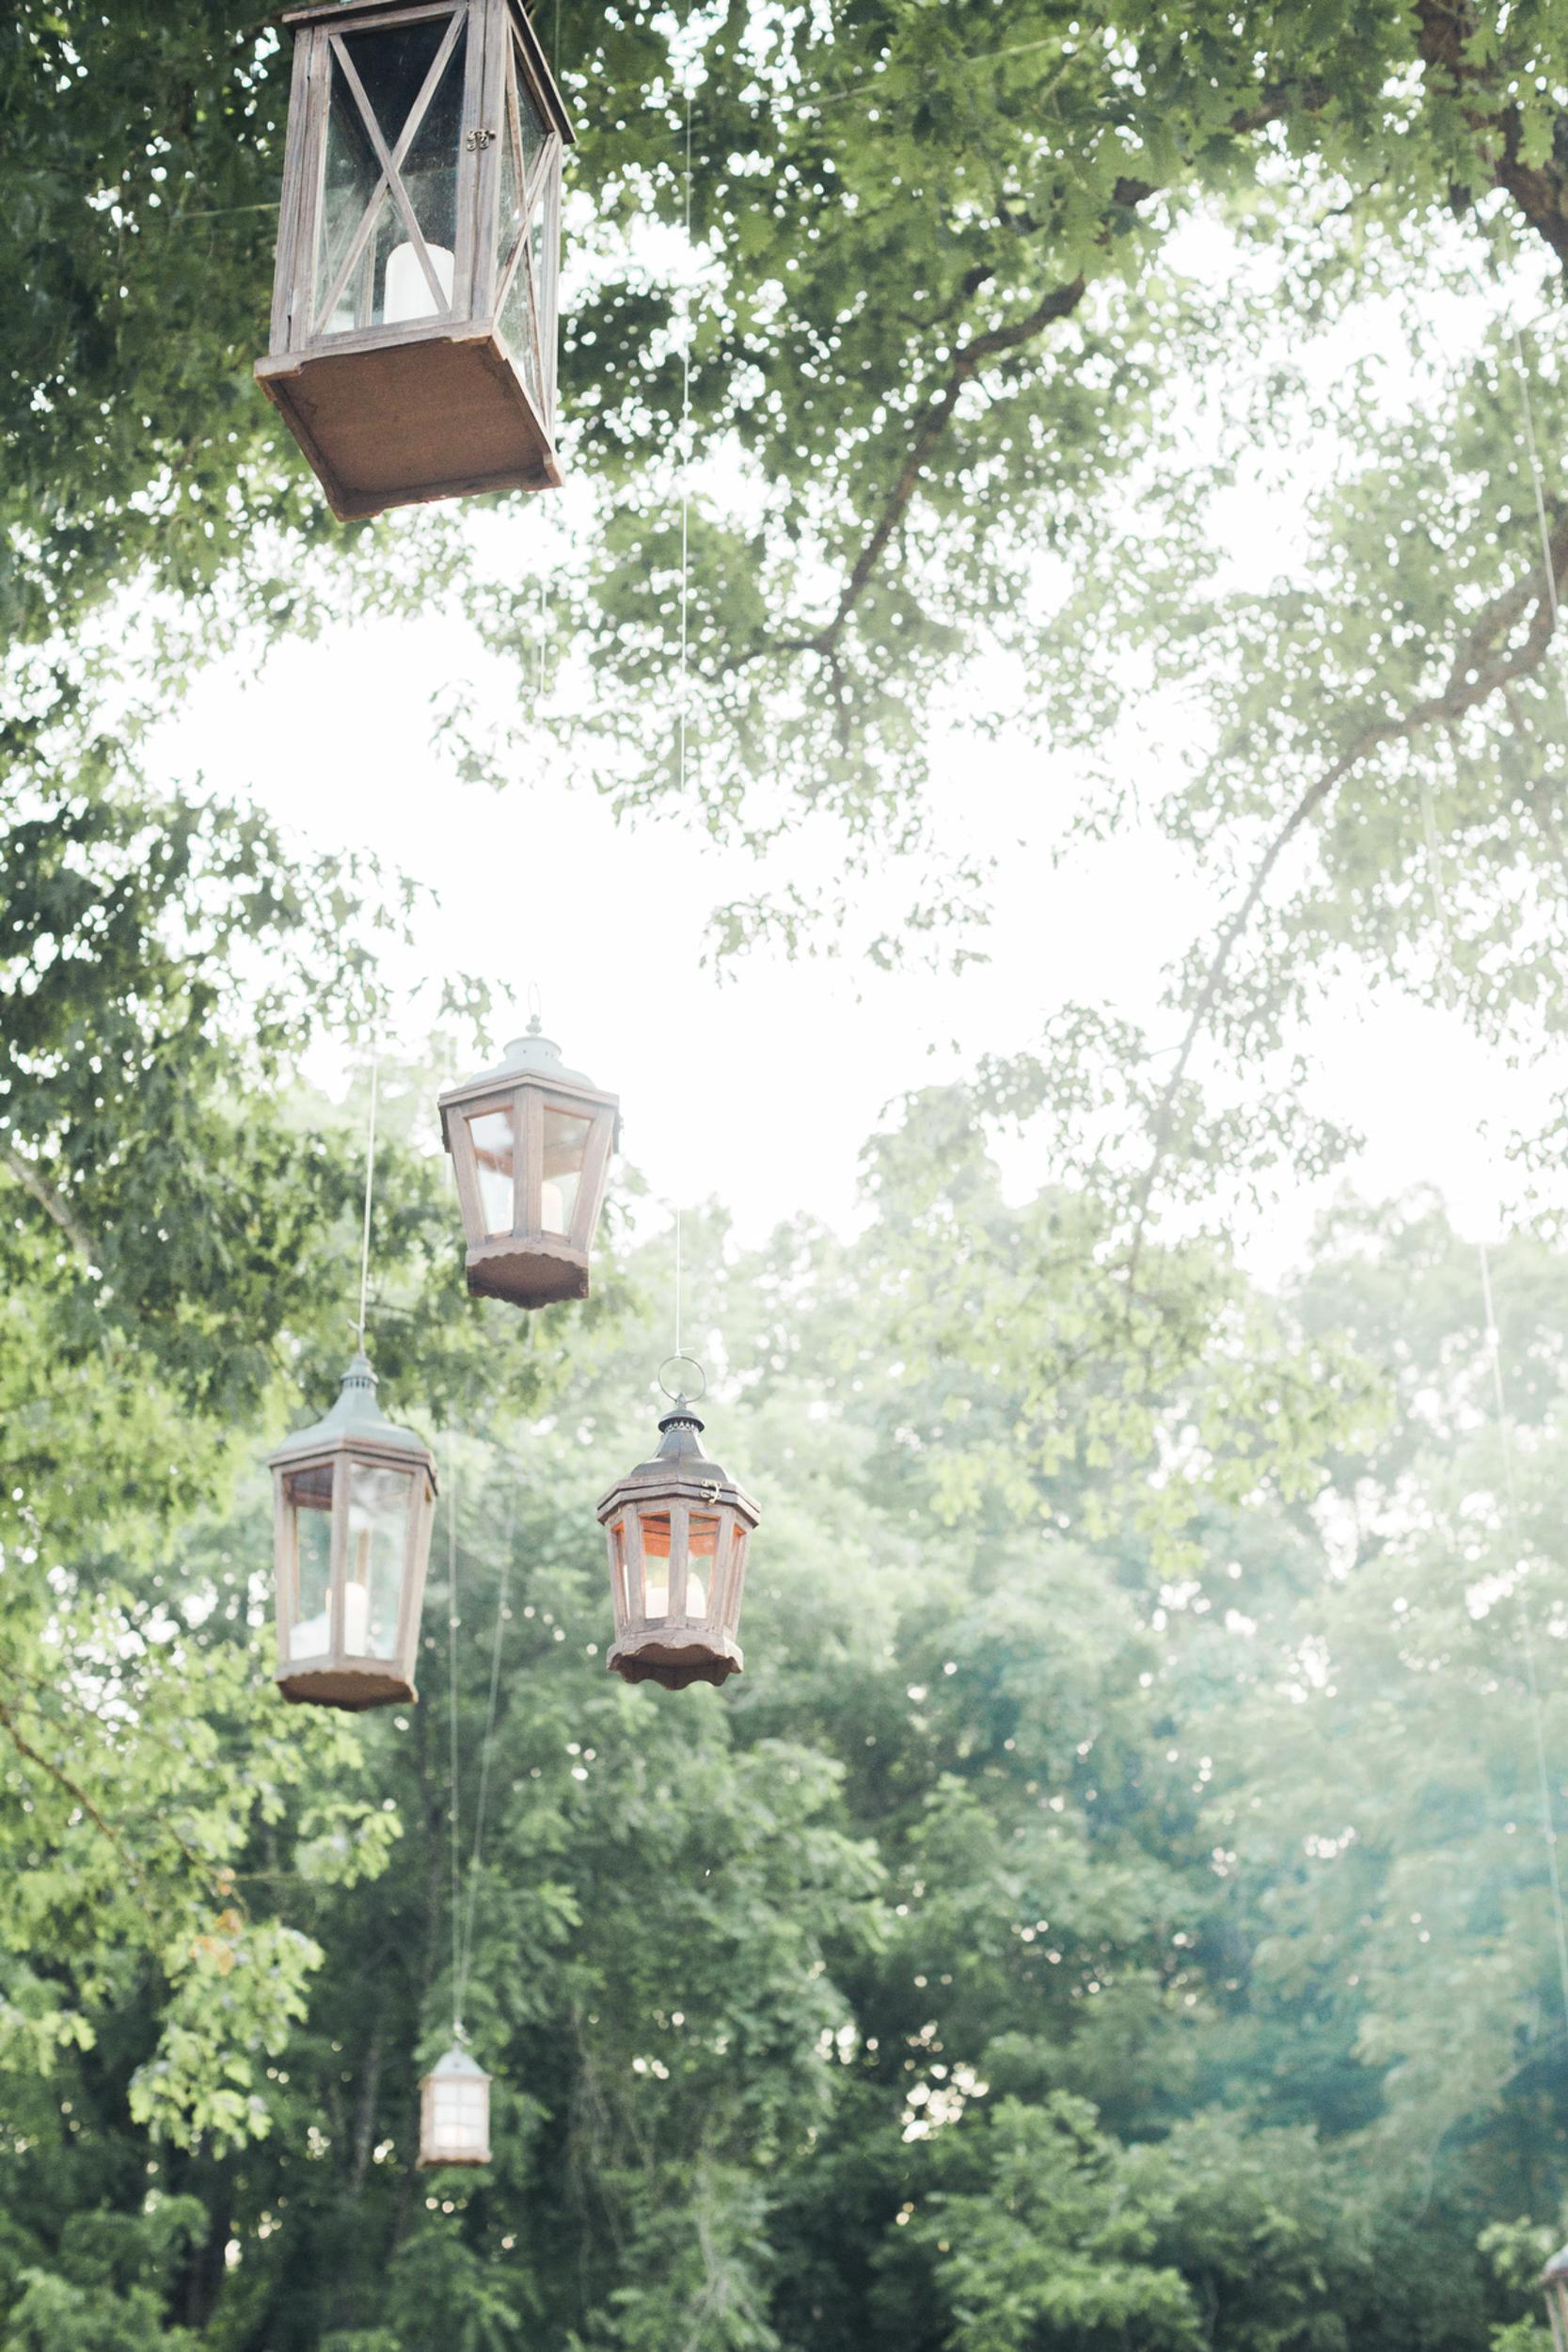 south_carolina_farm_wedding_rustic_chic_surprise_secret_luxe_wedding_bachelorette_emily_maynard_real_weddings-22.jpg